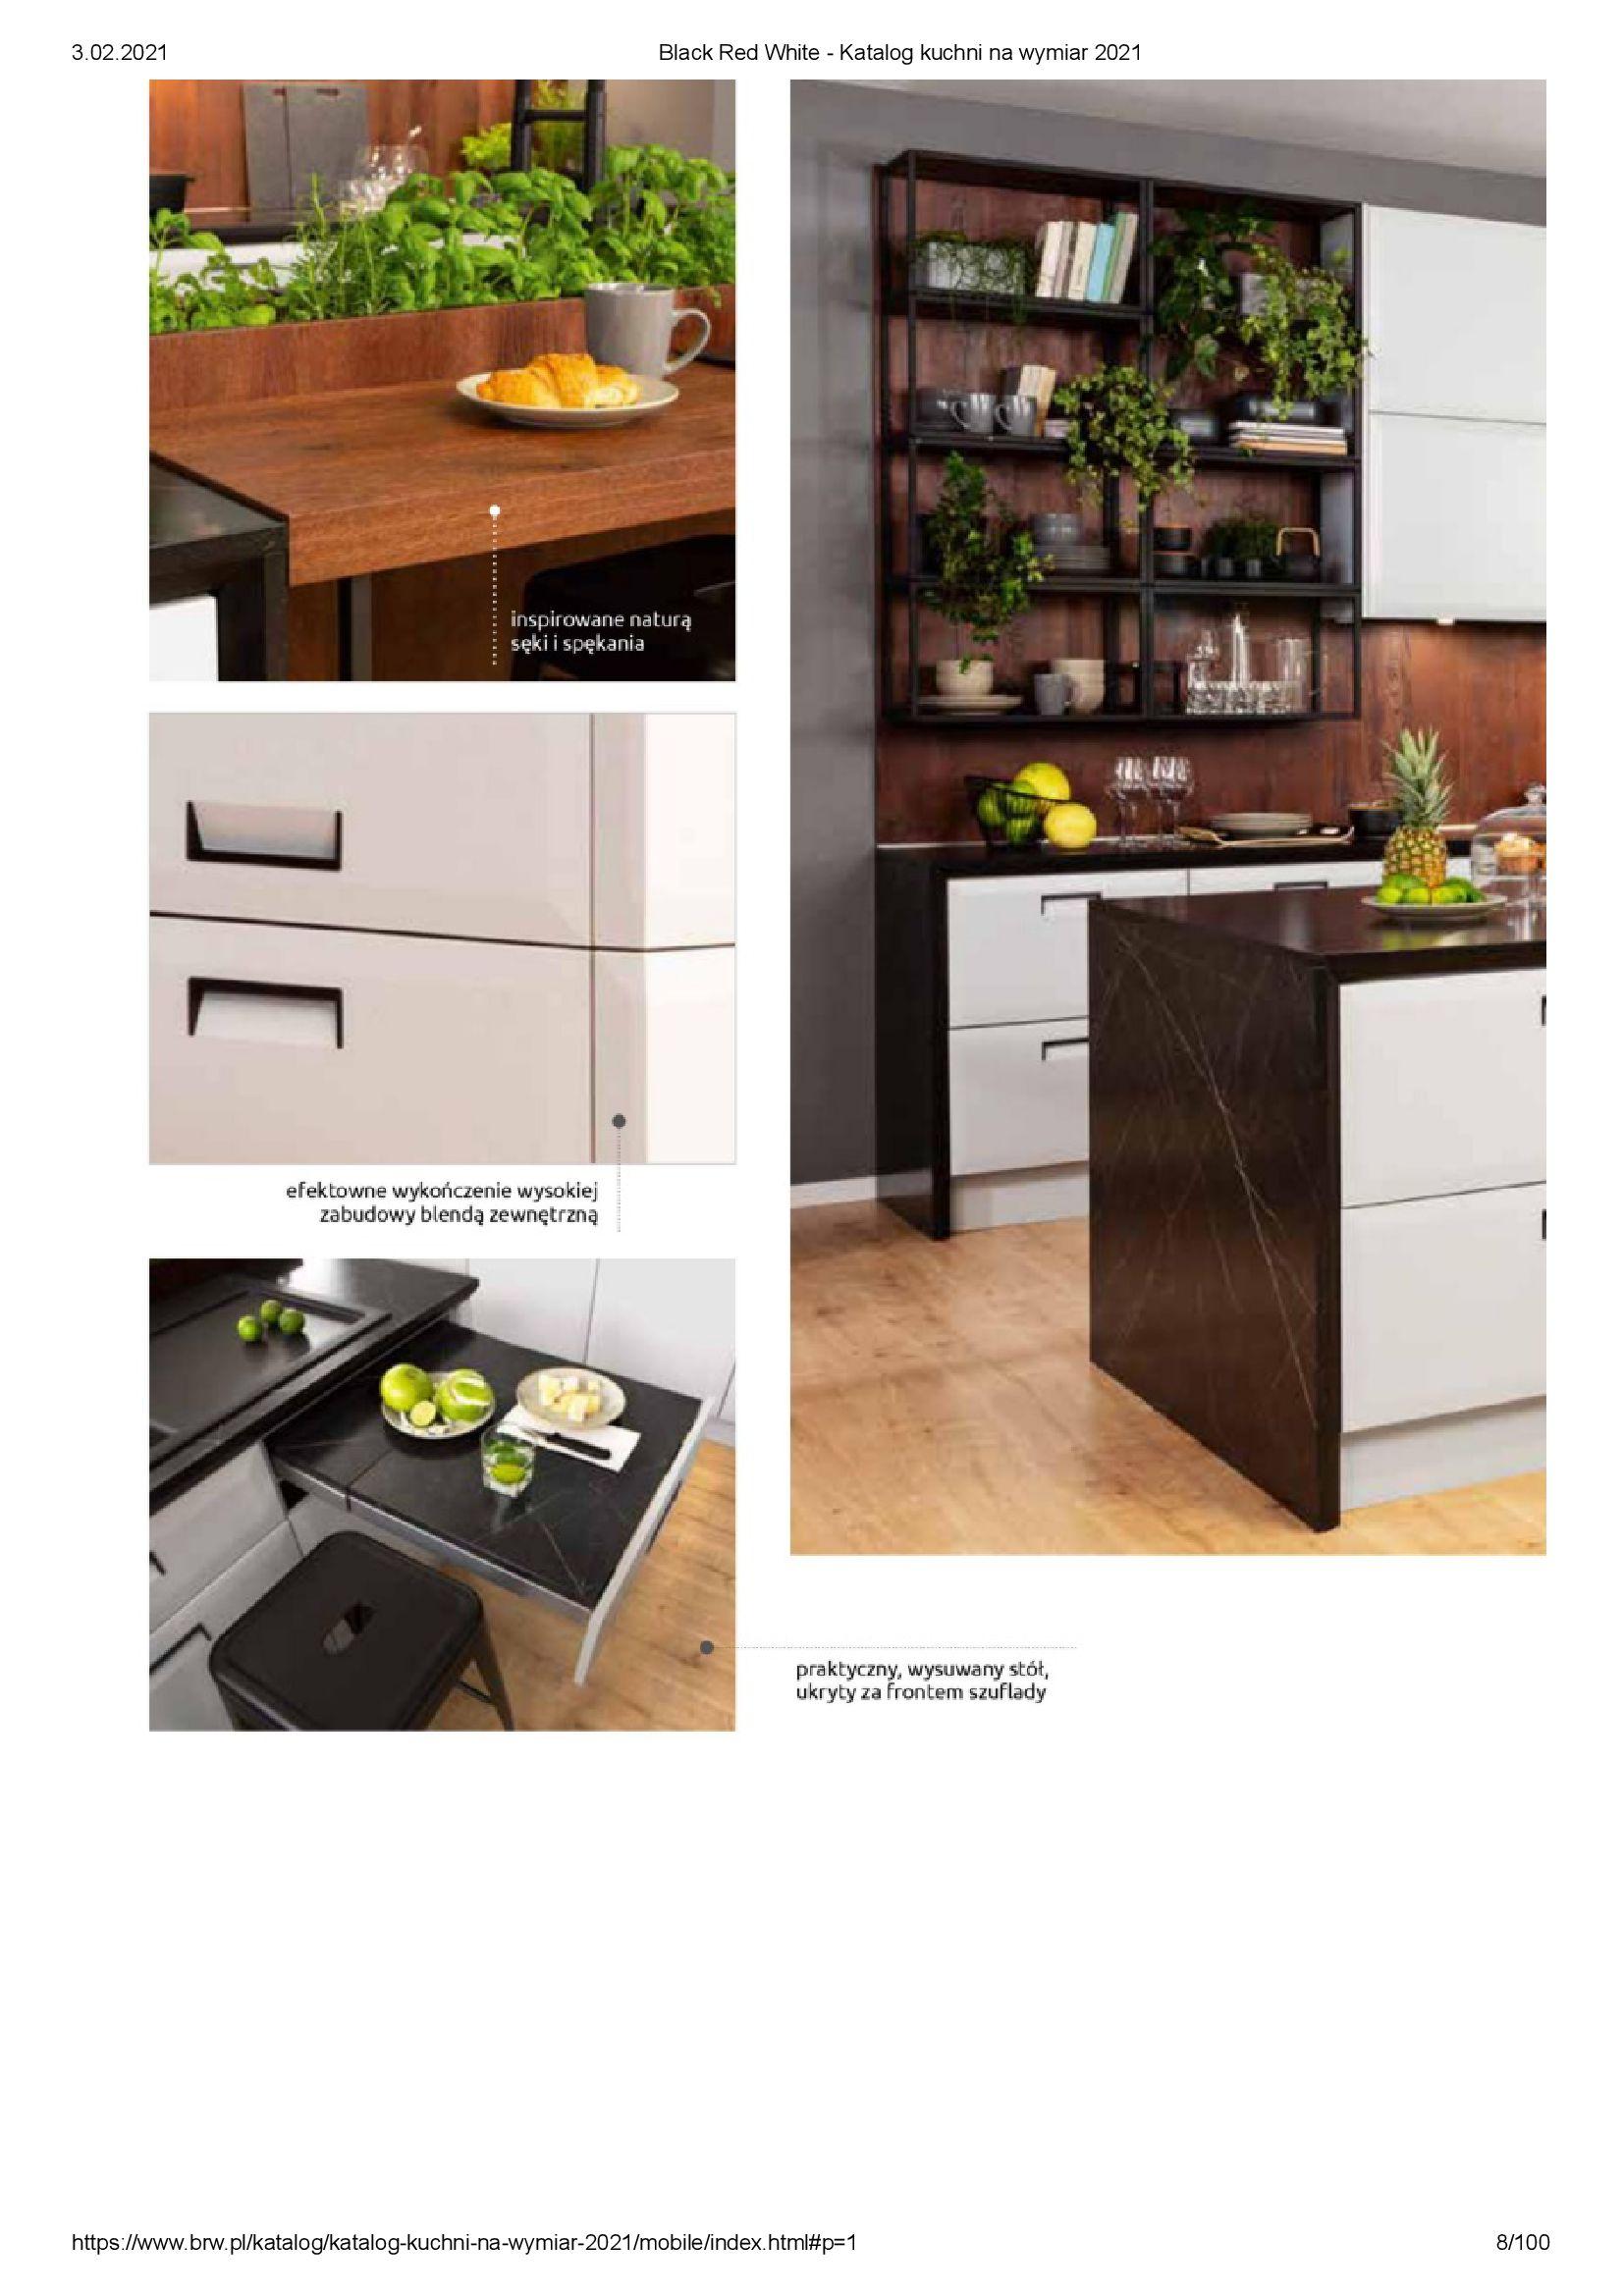 Gazetka Black Red White: Katalog - Kuchnie na wymiar Senso Kitchens 2021 2021-01-01 page-8